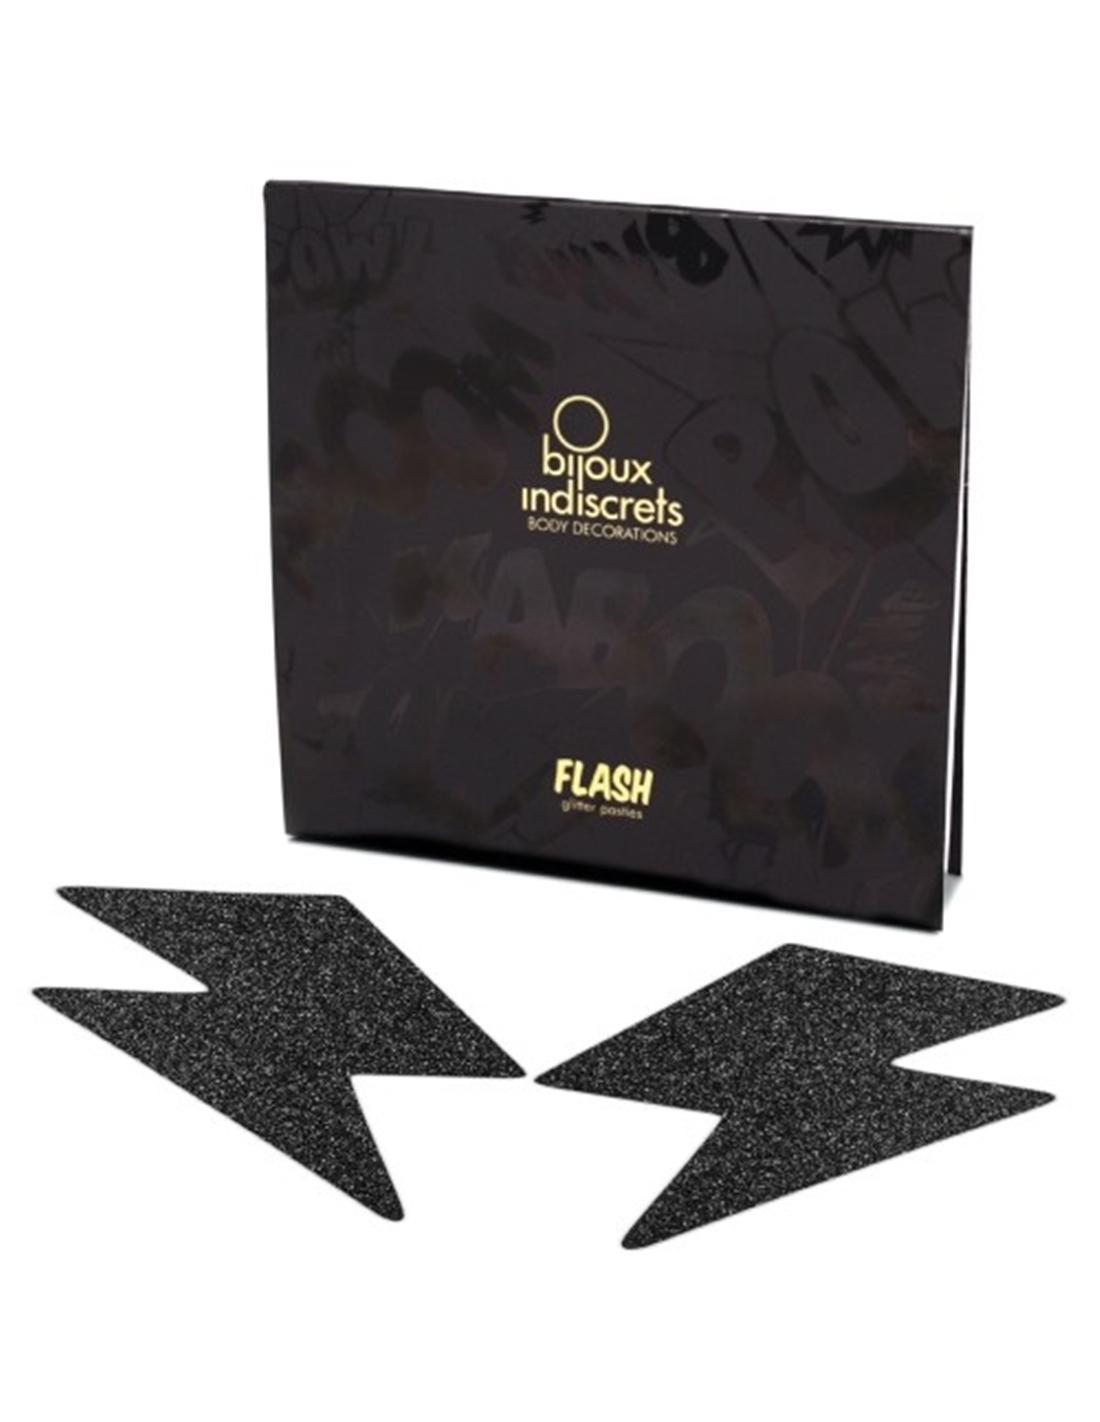 Tapa Mamilos Flash Glitter Bolt Bijoux Indiscrets Pretos - PR2010324331